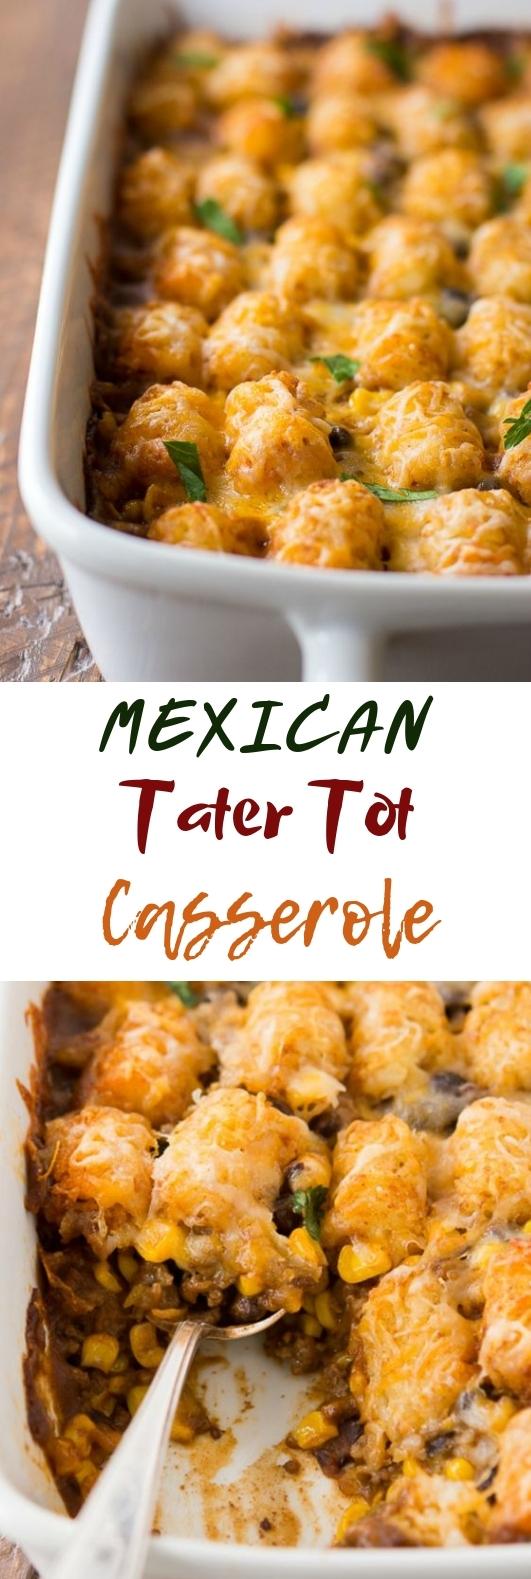 Mexican Tater Tot Casserole #deliciousrecipe #dinner